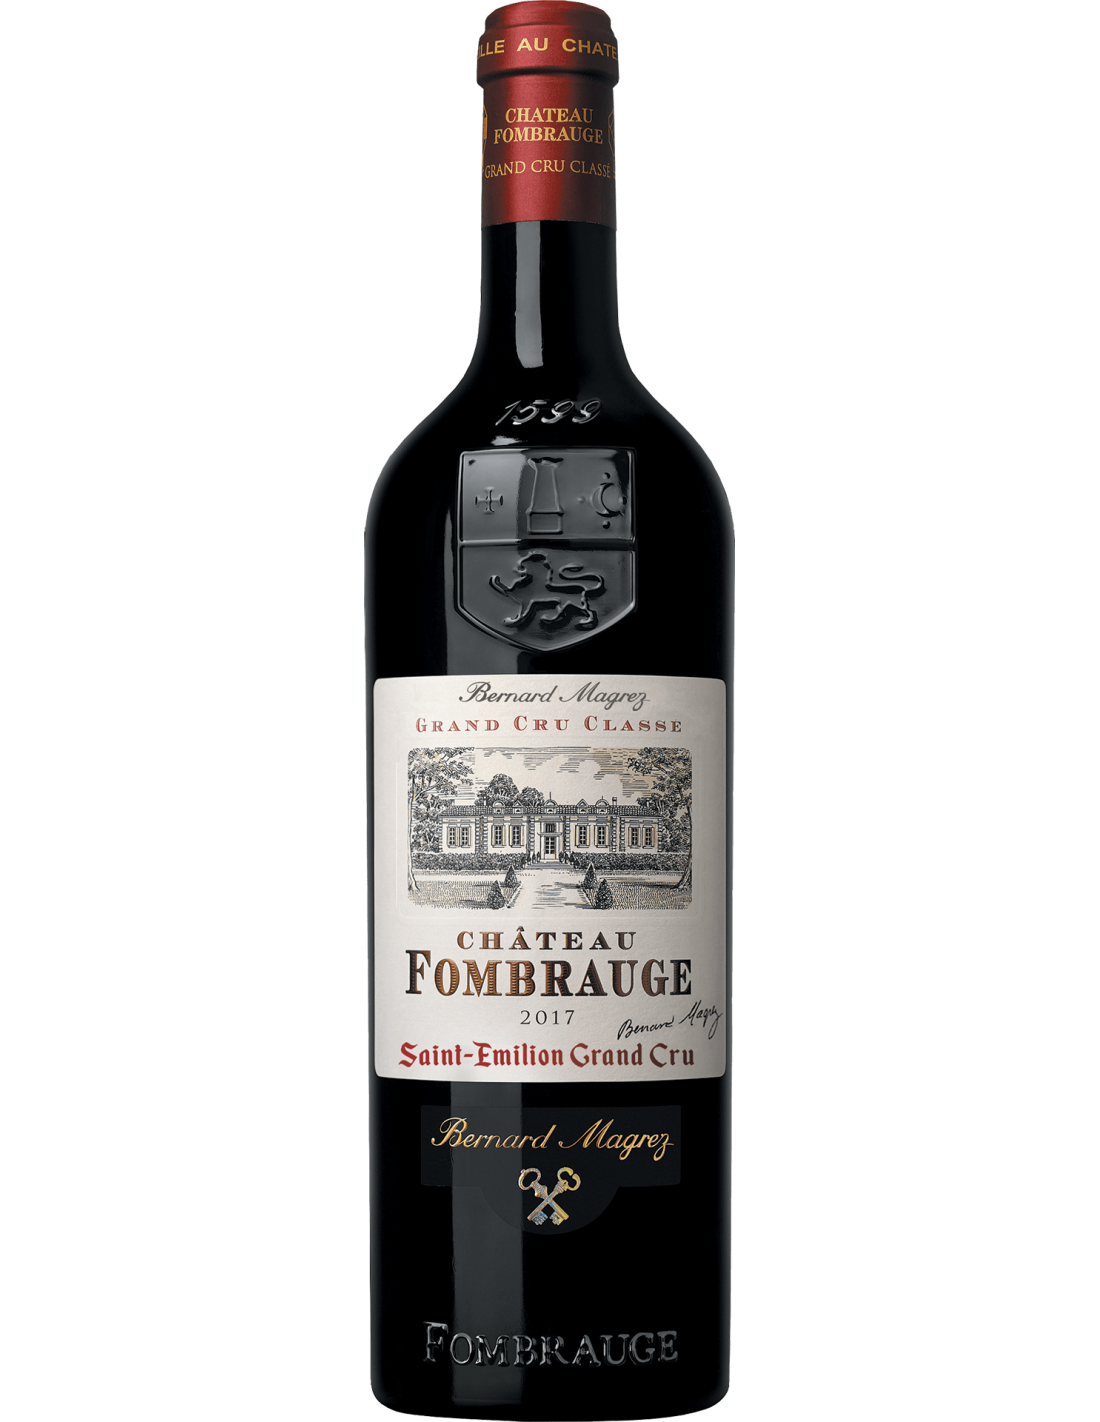 Vin rosu, Chateau Fombrauge Saint-Emilion, 0.75L, 14.5% alc., Franta